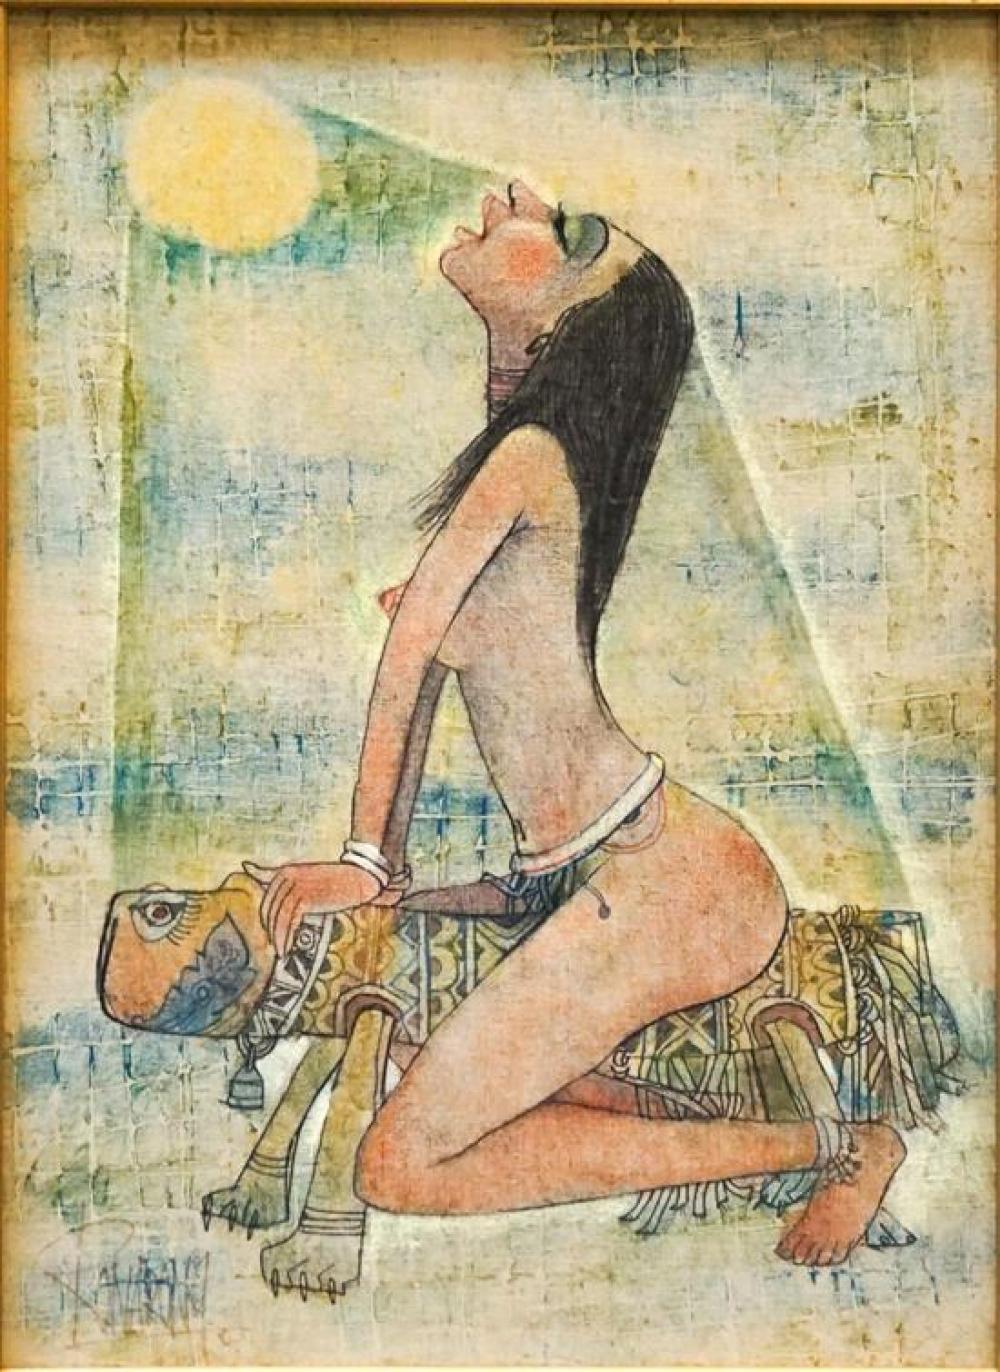 Thanomtup Ronarong (Thai b 1945), Woman in Sun, Oil on Board, Frame: 30 x 23-1/2 in